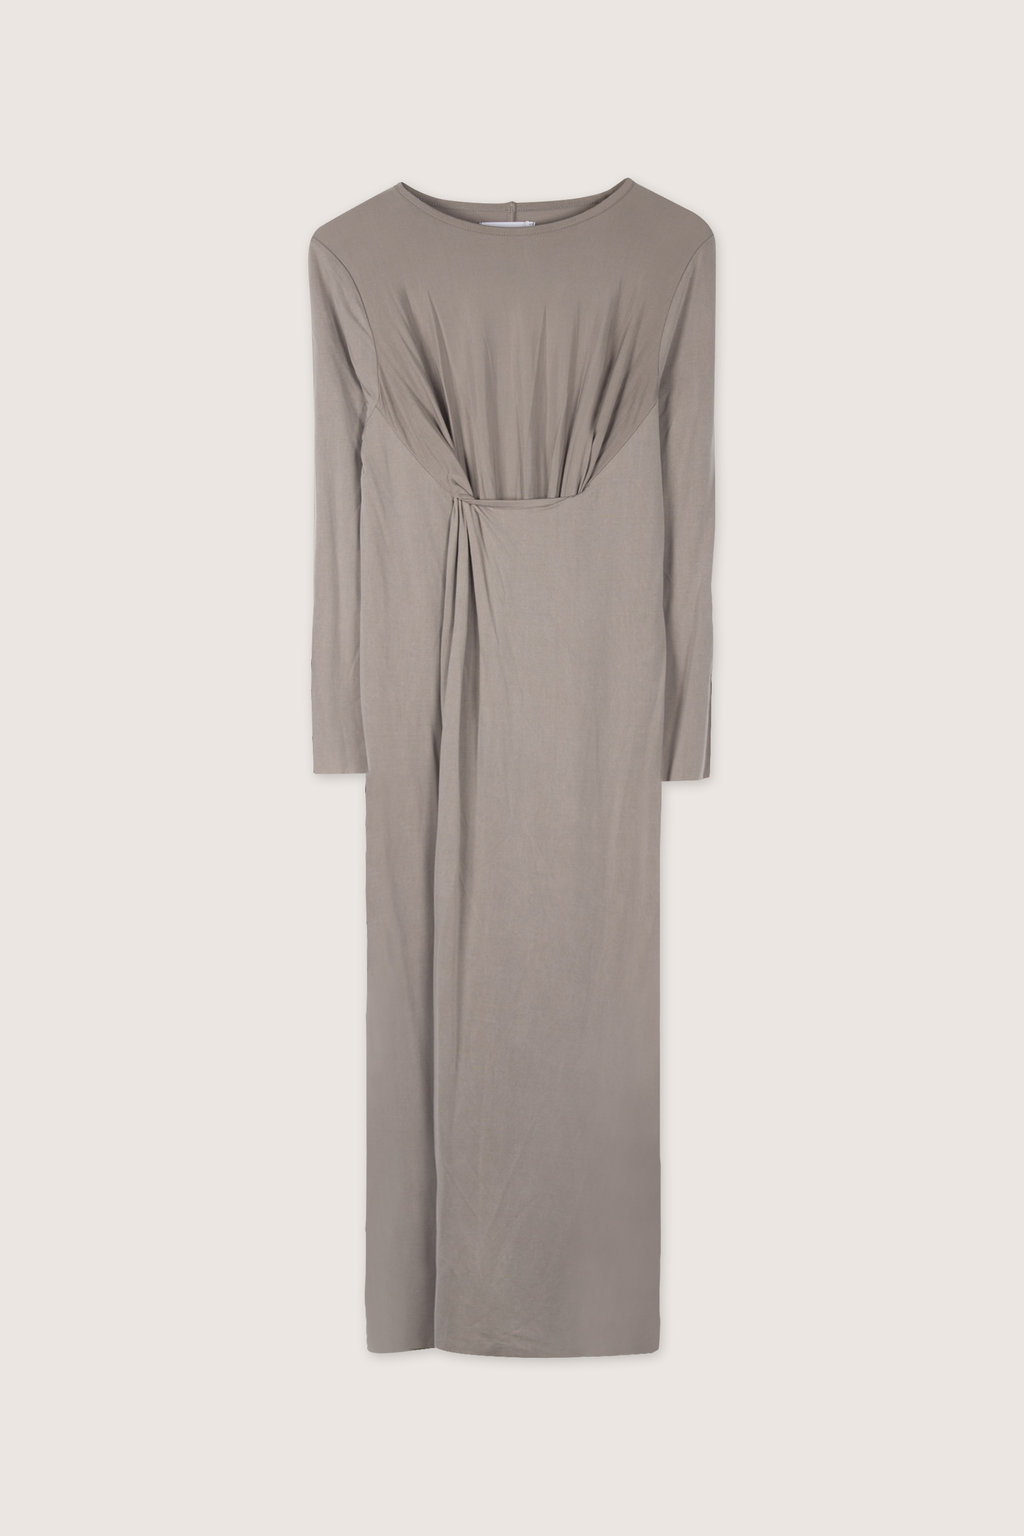 Dress 1673 Taupe 11